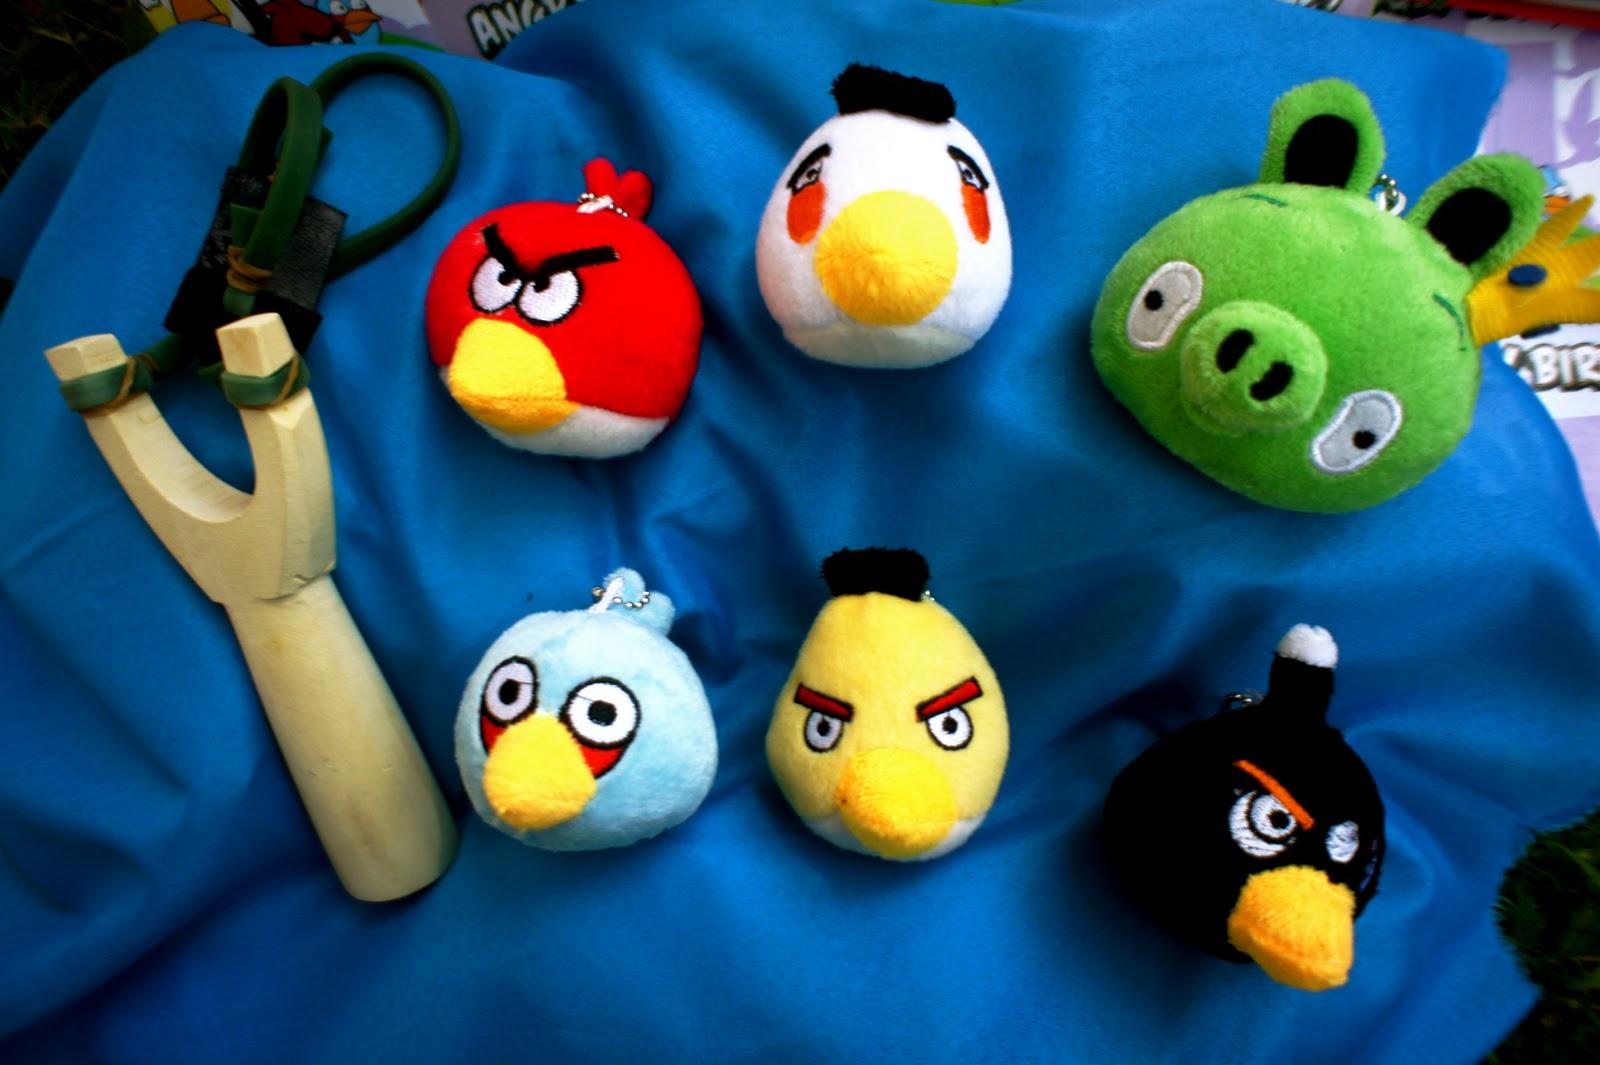 Anger Bird Toy : Angry birds plush toys